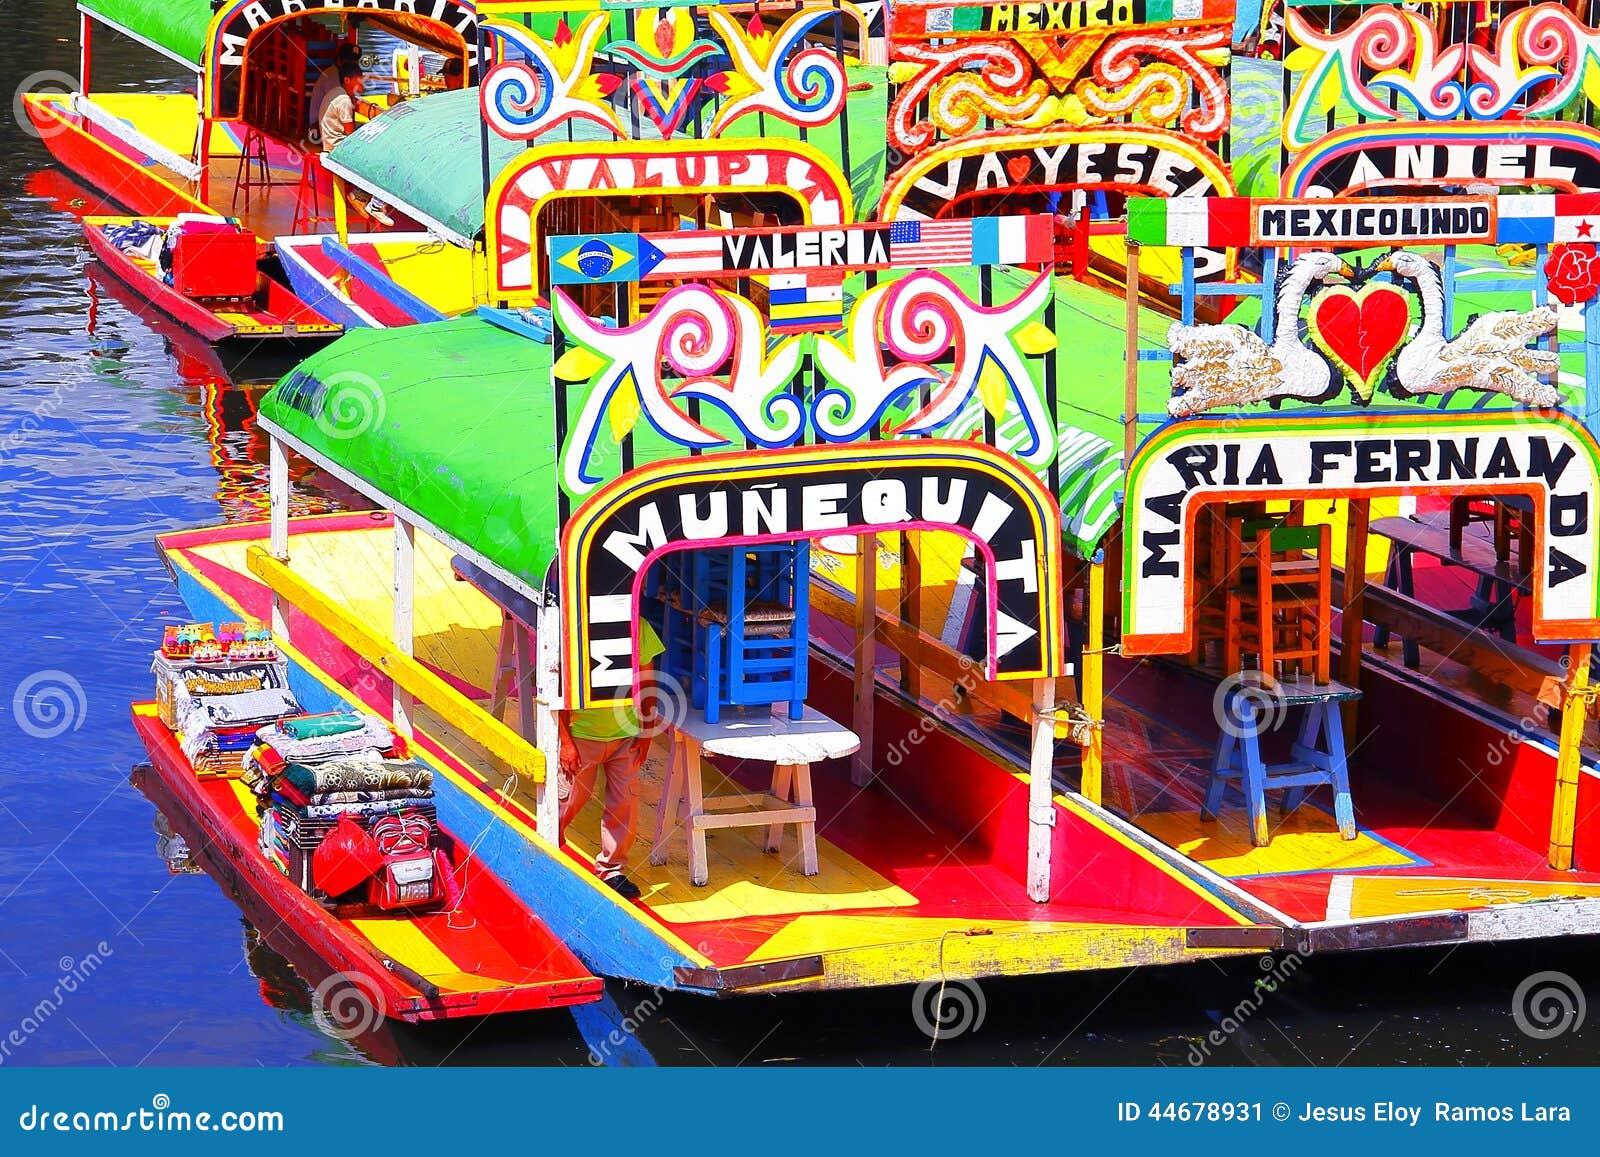 Xochimilco V Stock Image Image Of Name Touristic Travel 44678931